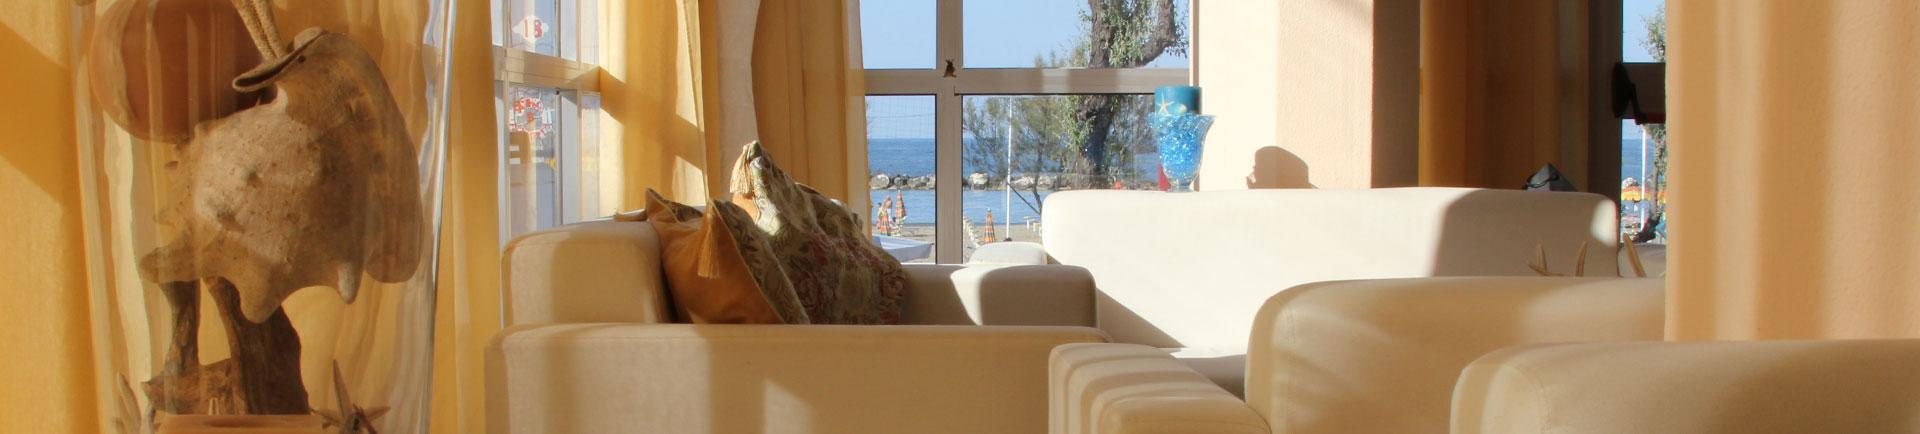 Hotel Viserba Rimini